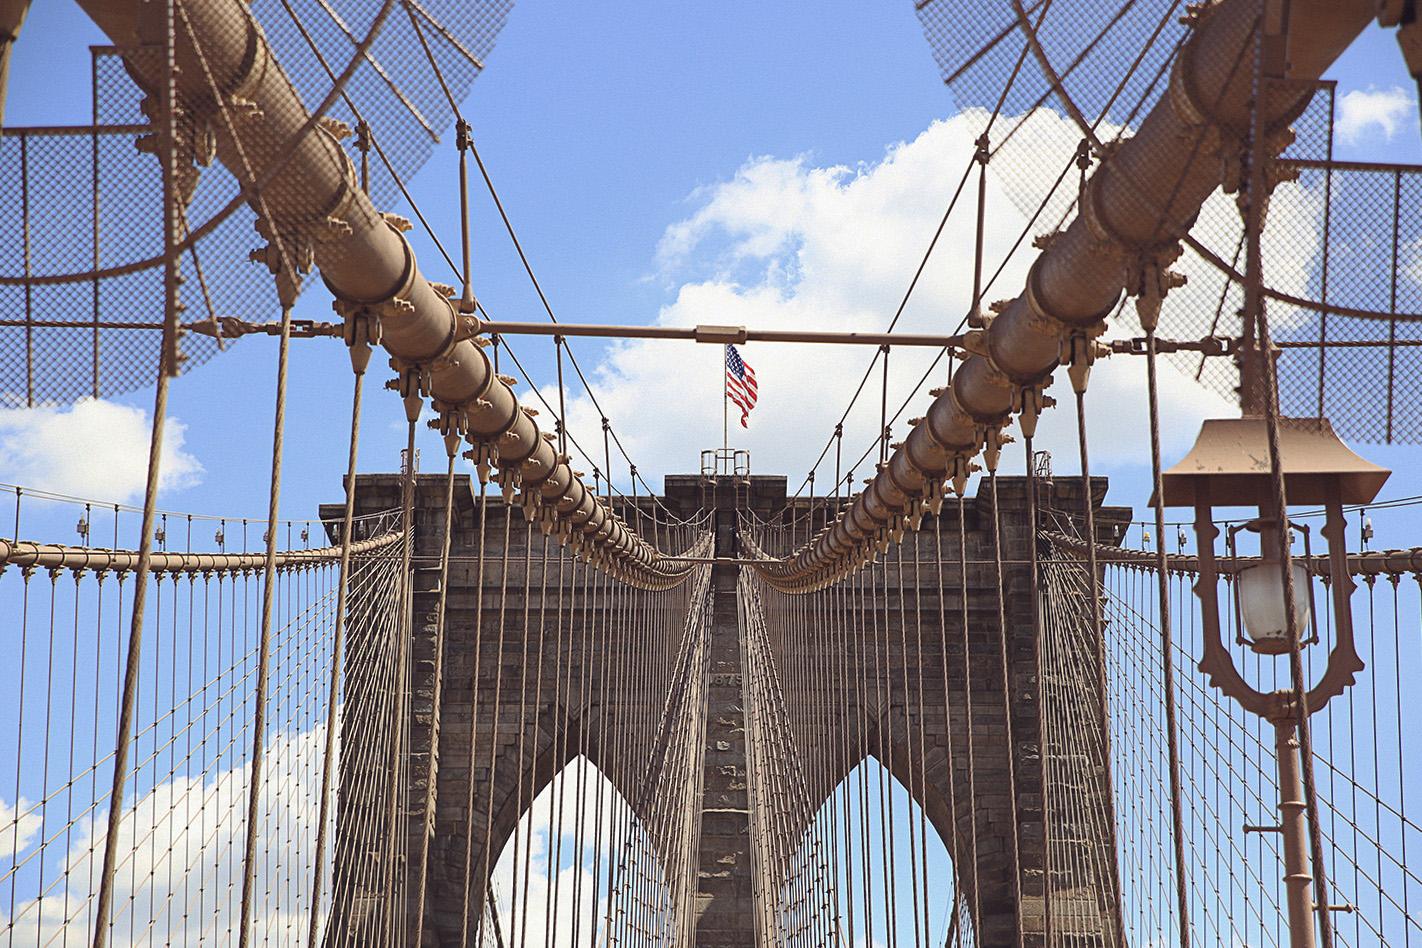 2016-08-07_NYC_Daytrip_063.jpg